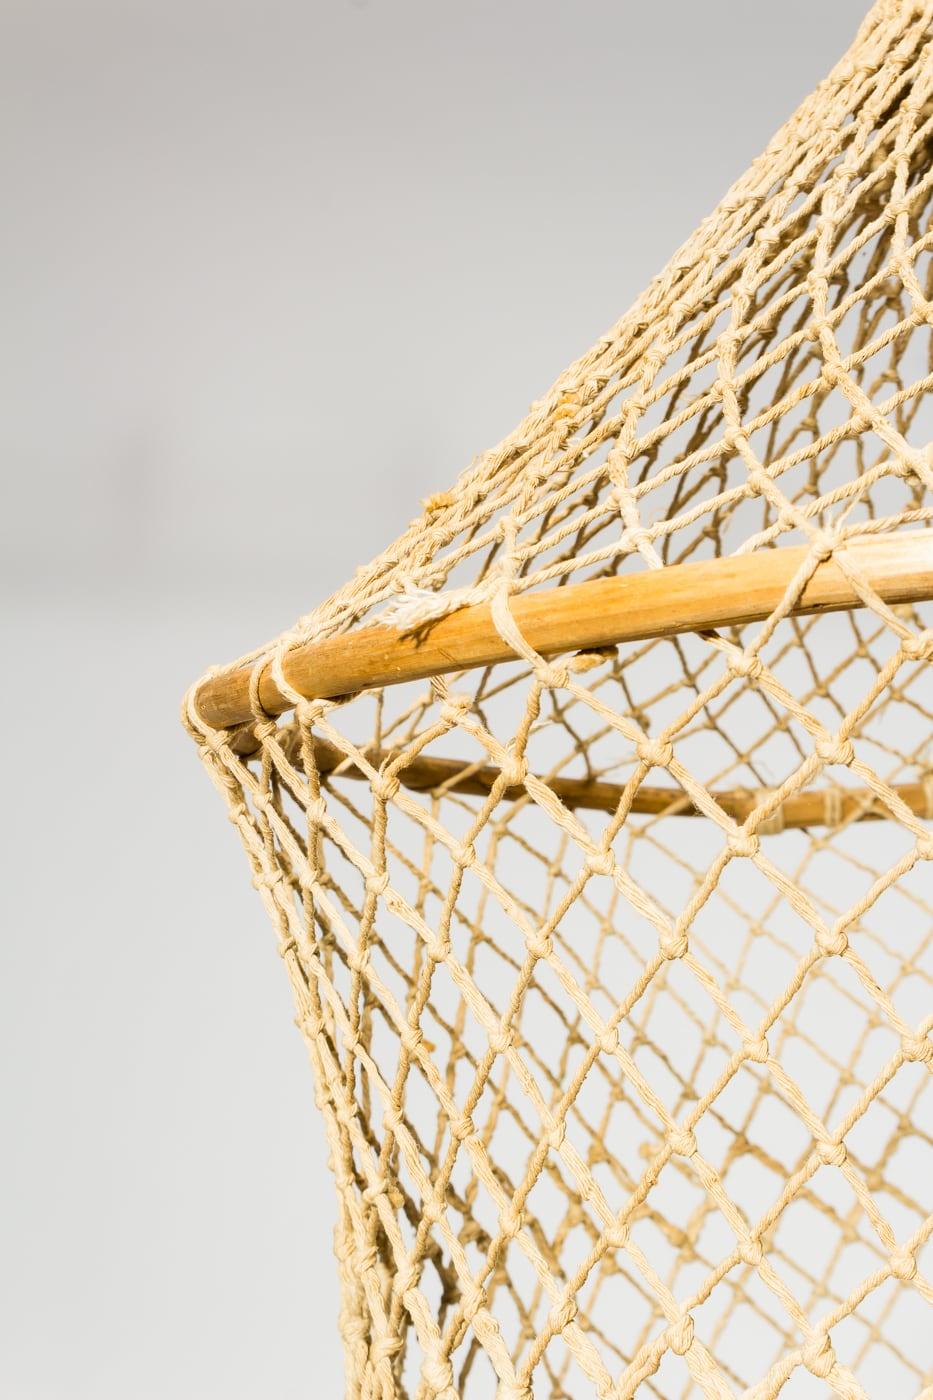 TA297 Woven Hoop Rope Net Prop Rental  ACME Brooklyn